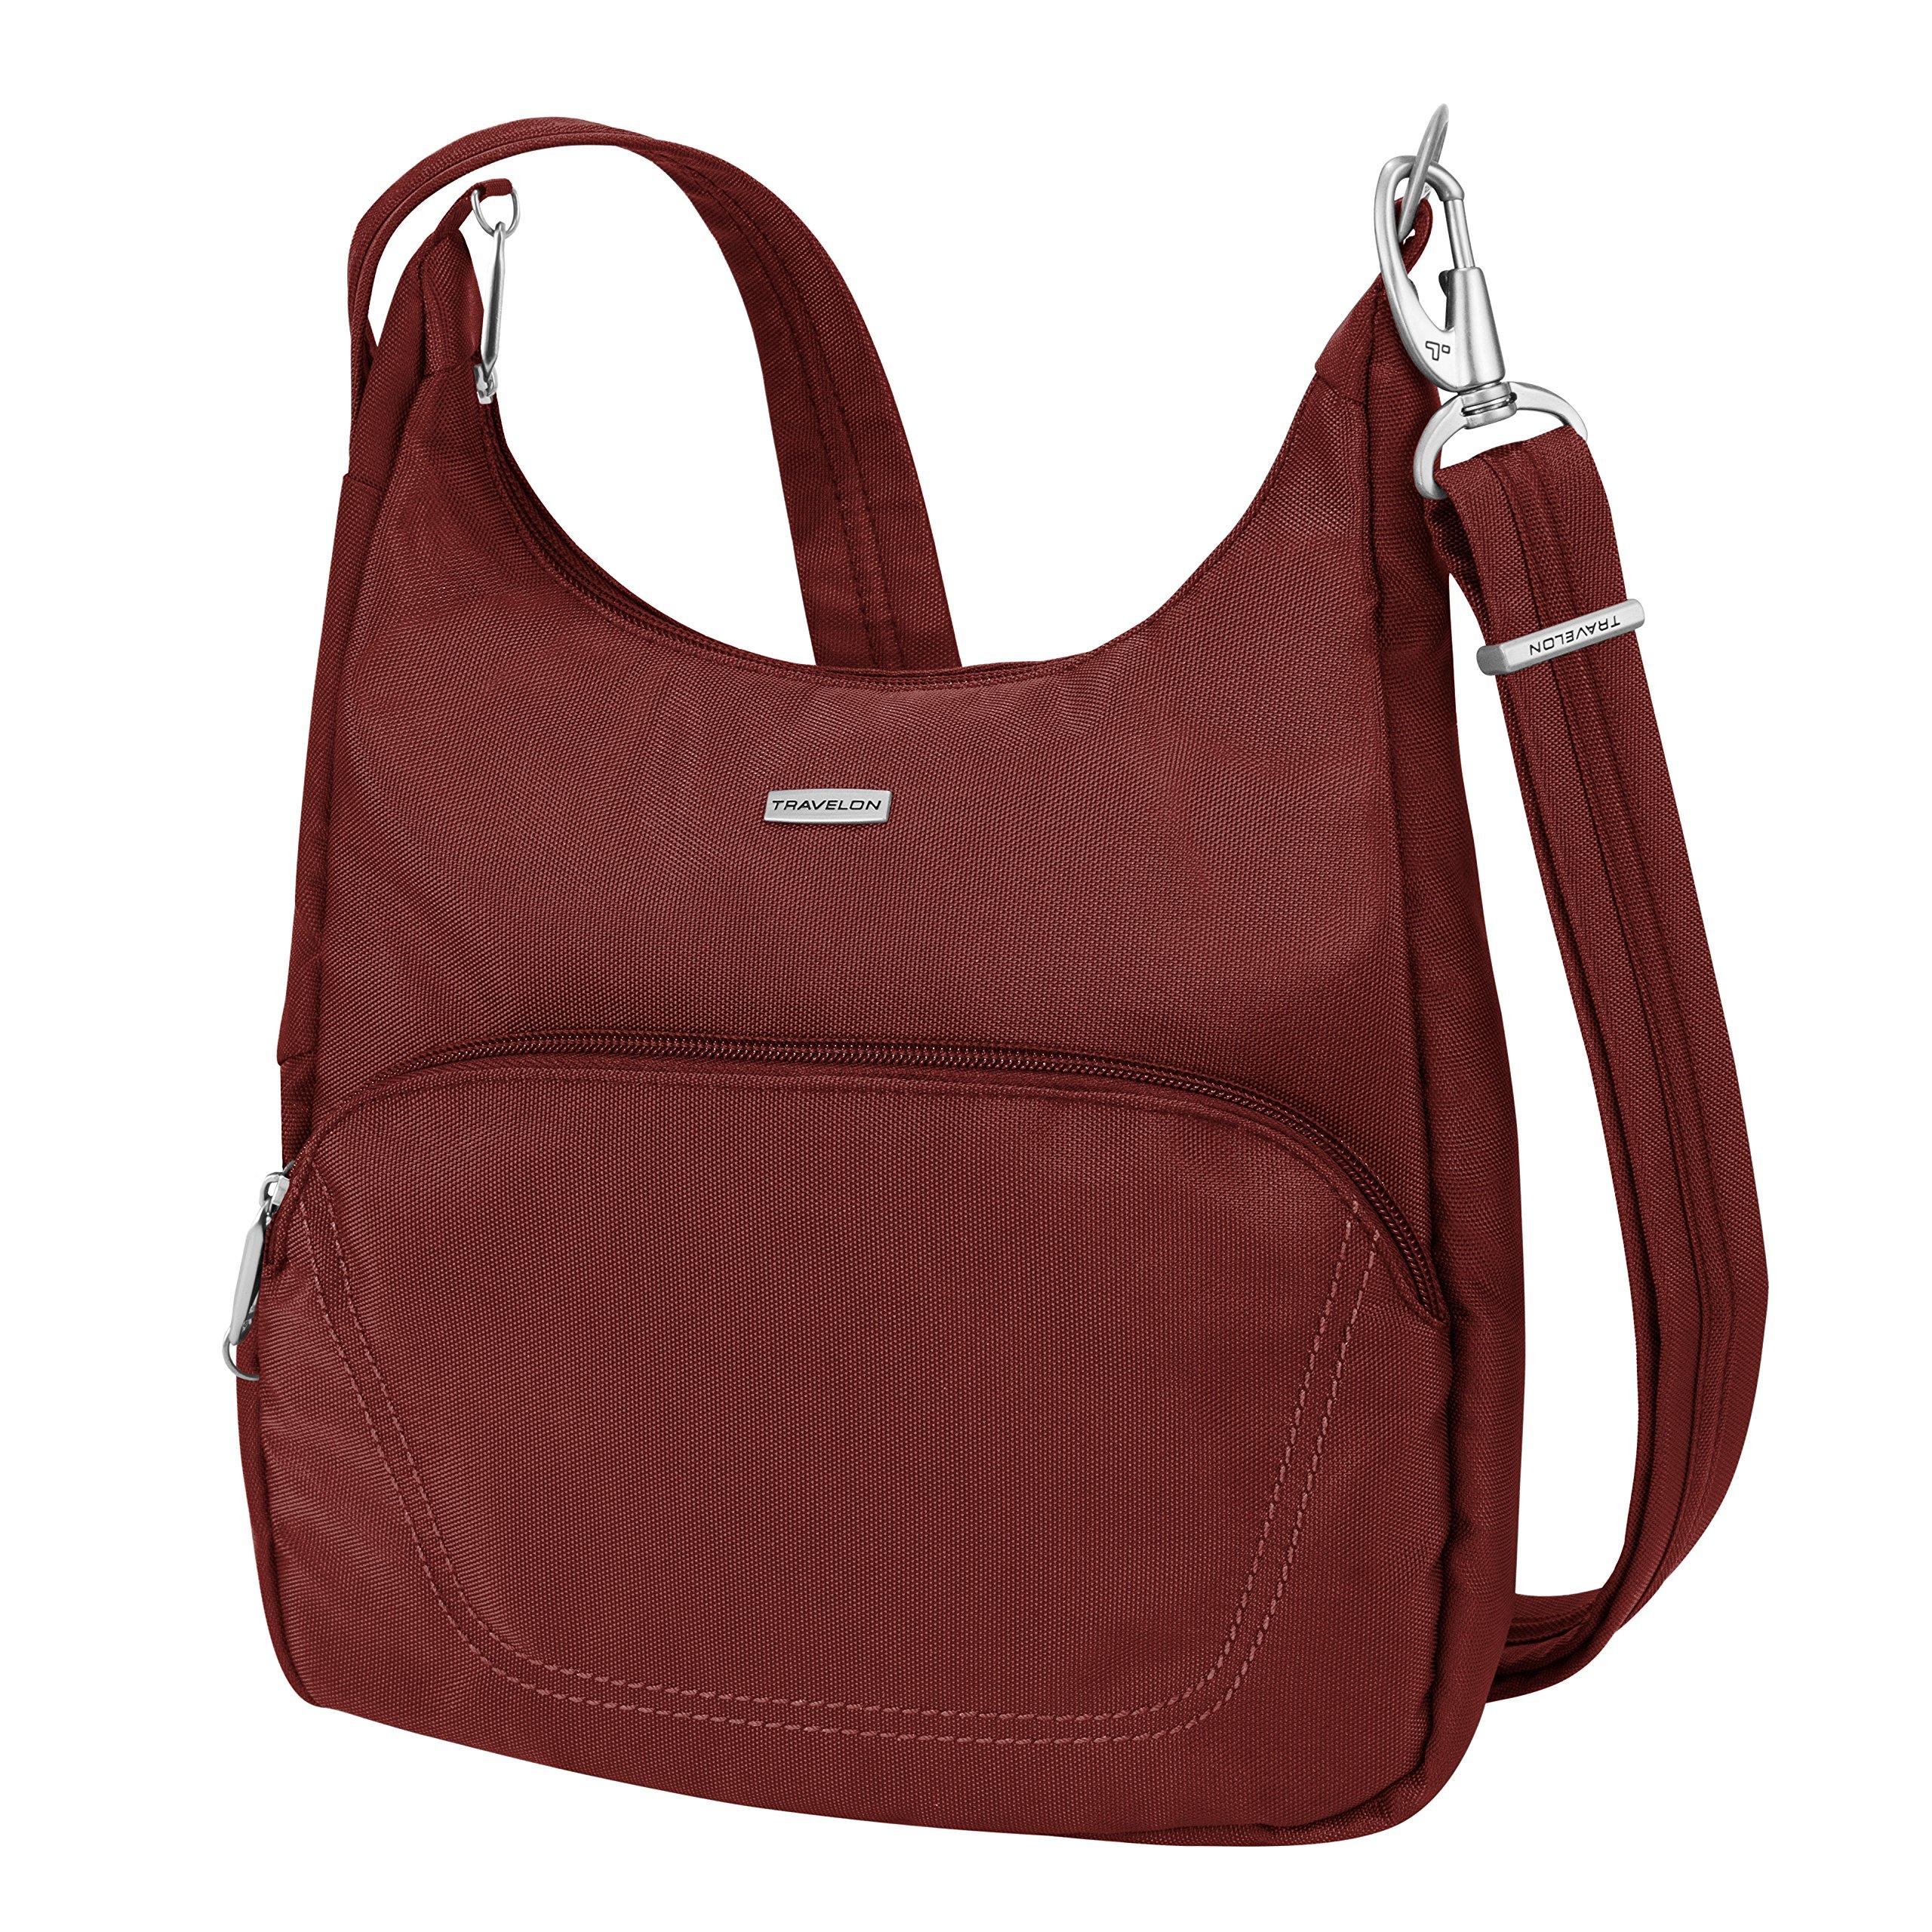 Travelon Anti-Theft Classic Essential Messenger Bag, Wine